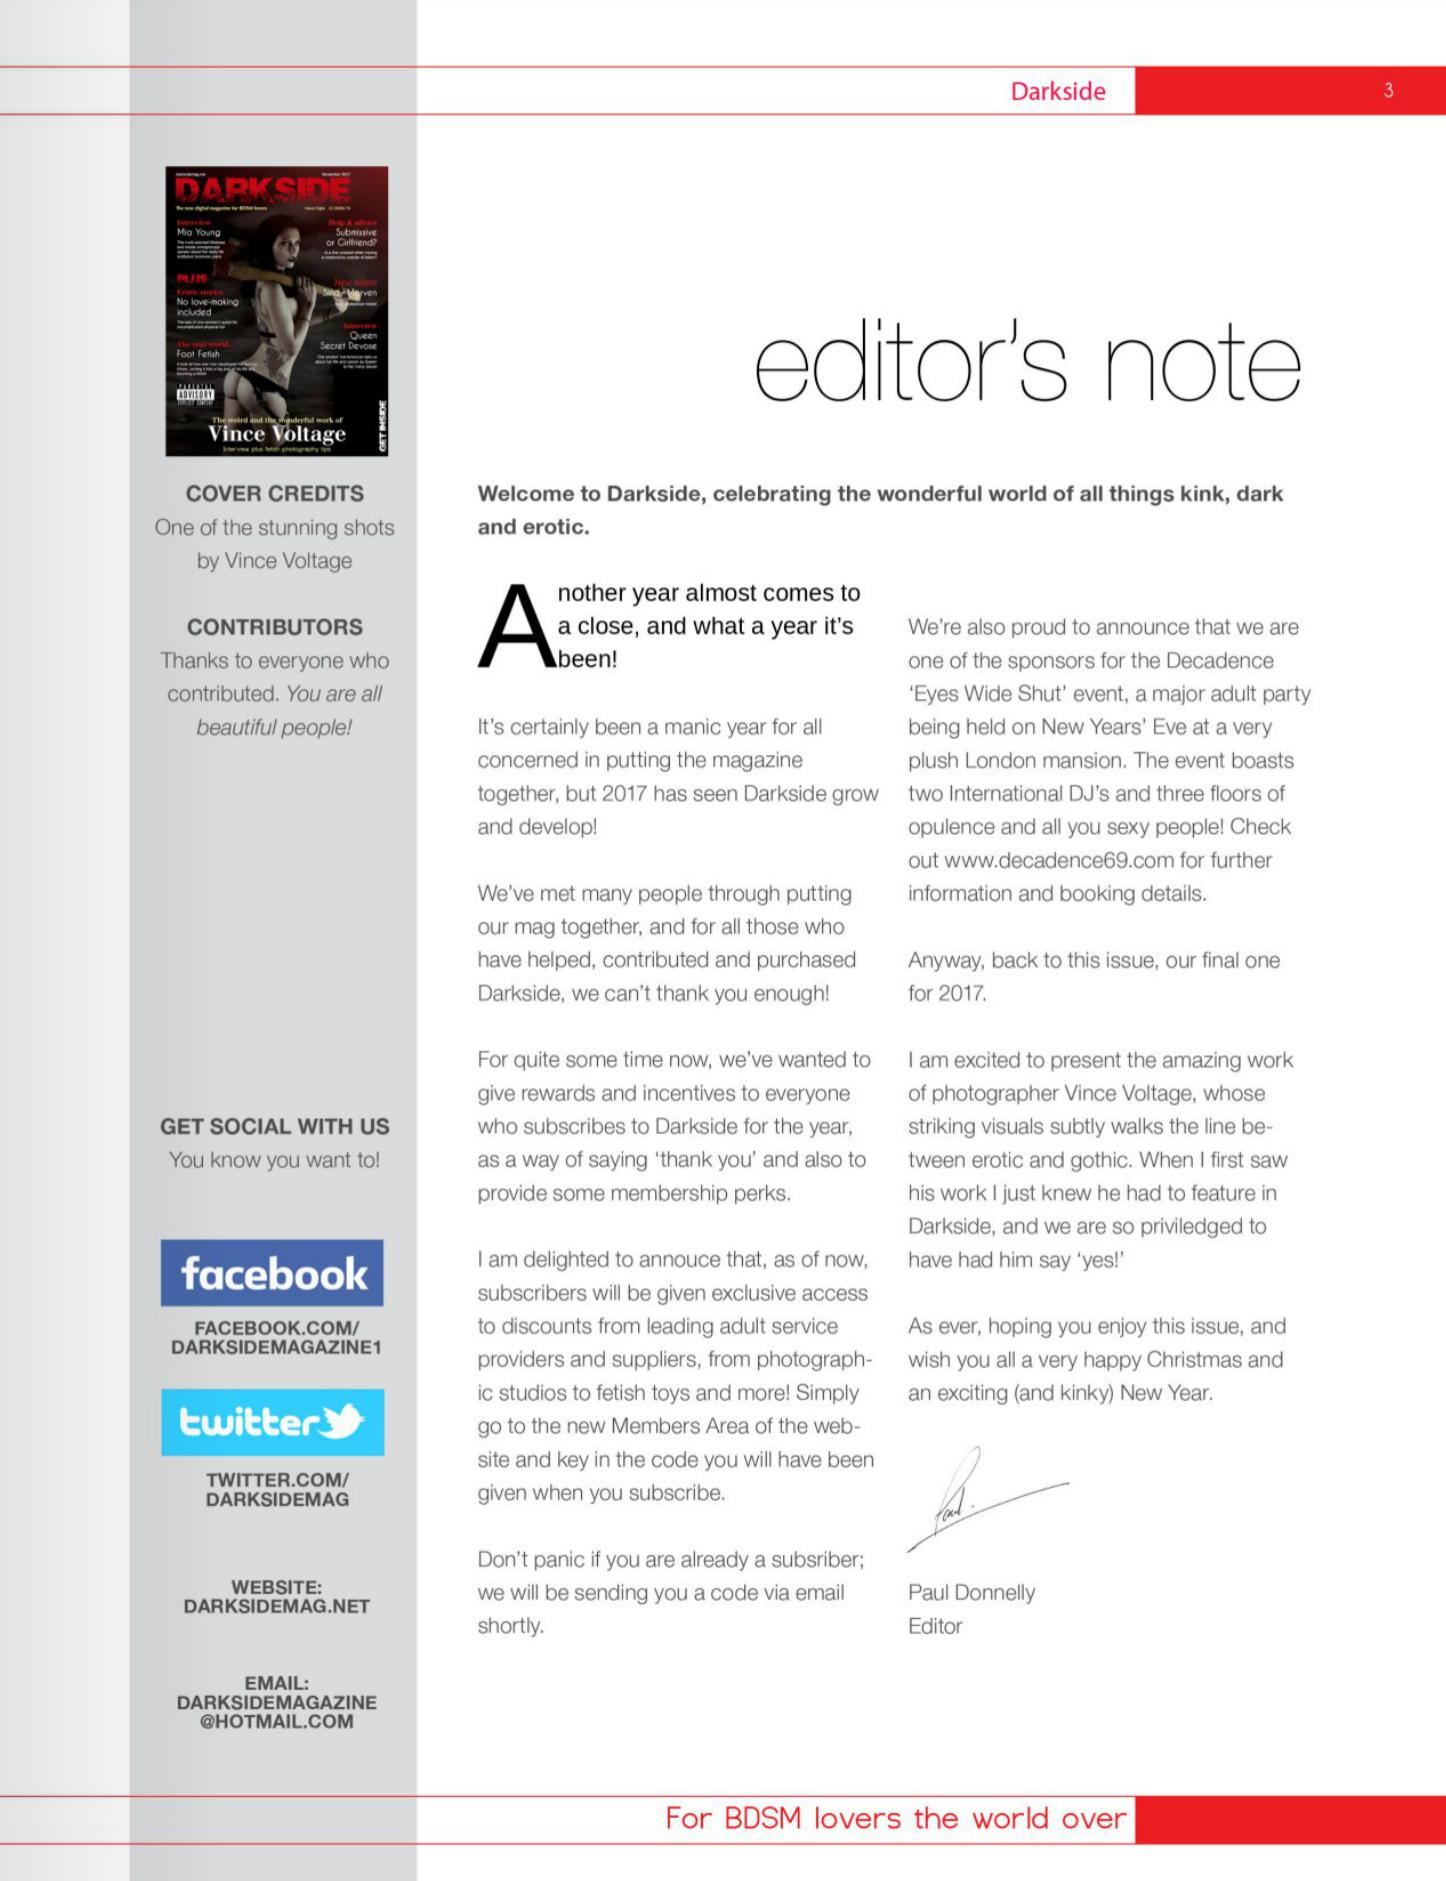 Darkside editorial